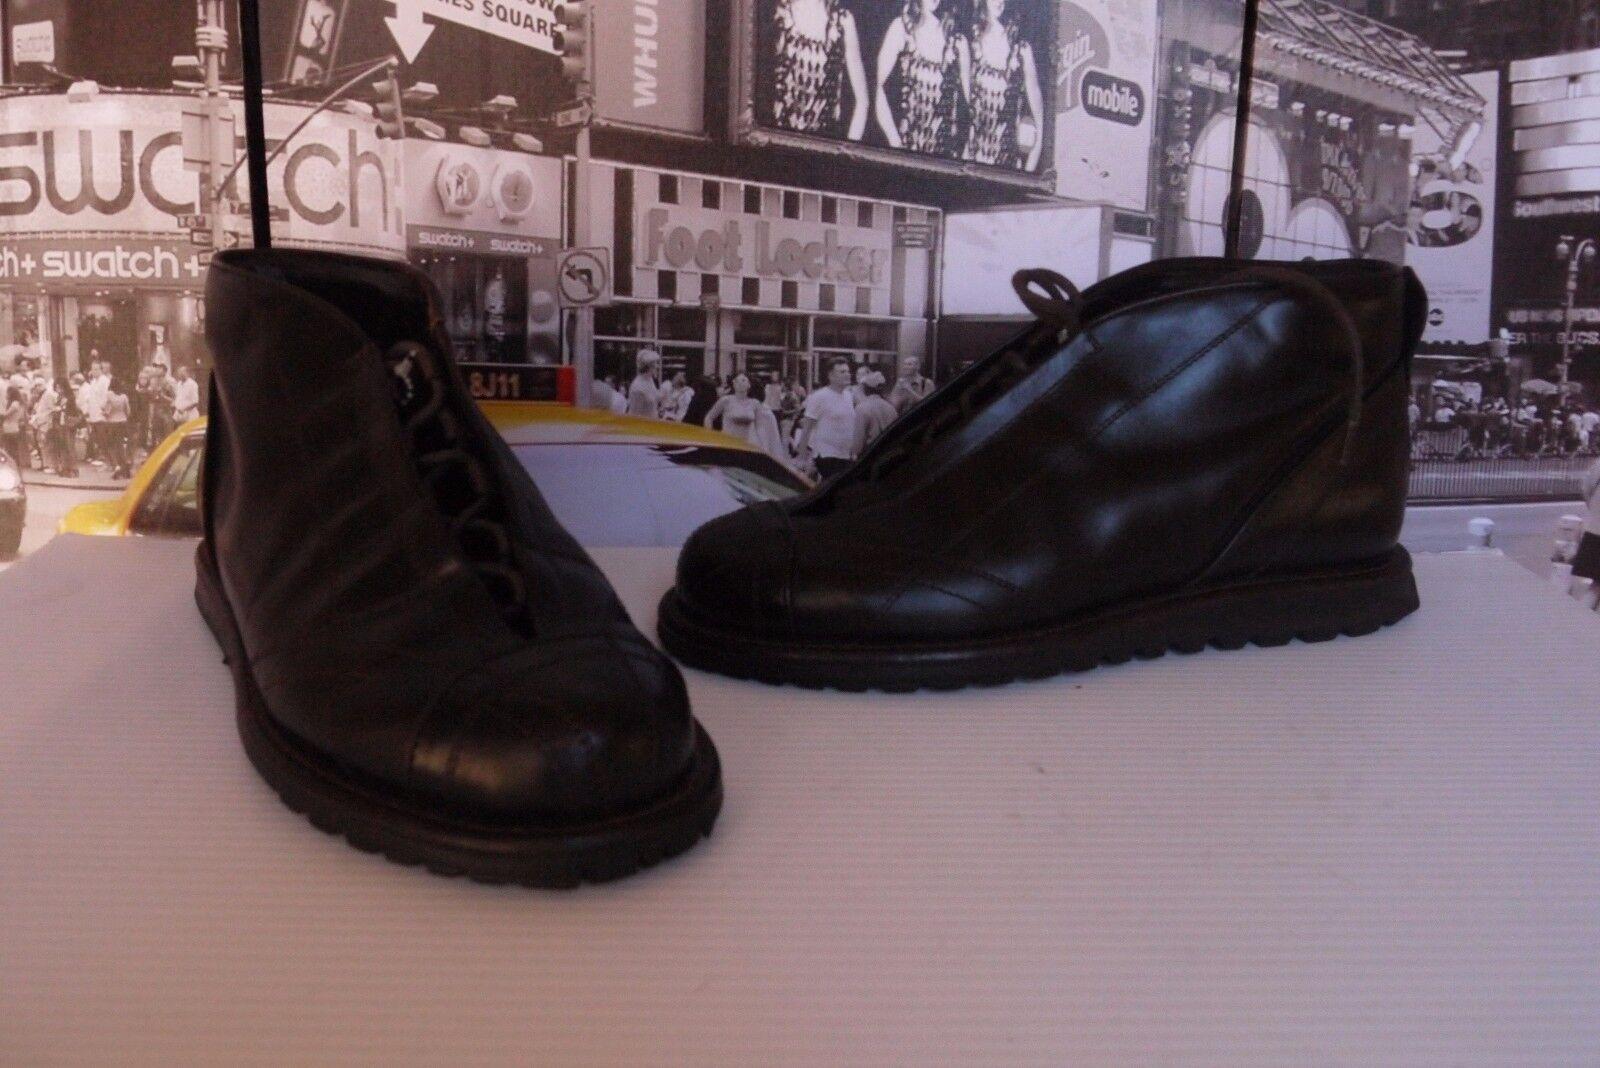 GORDON RUSH ITALY INSTINCT BOOTS CHUKKA CAP TOE SIZE US US US 8 EUR 41 NICE !!! 7fa803